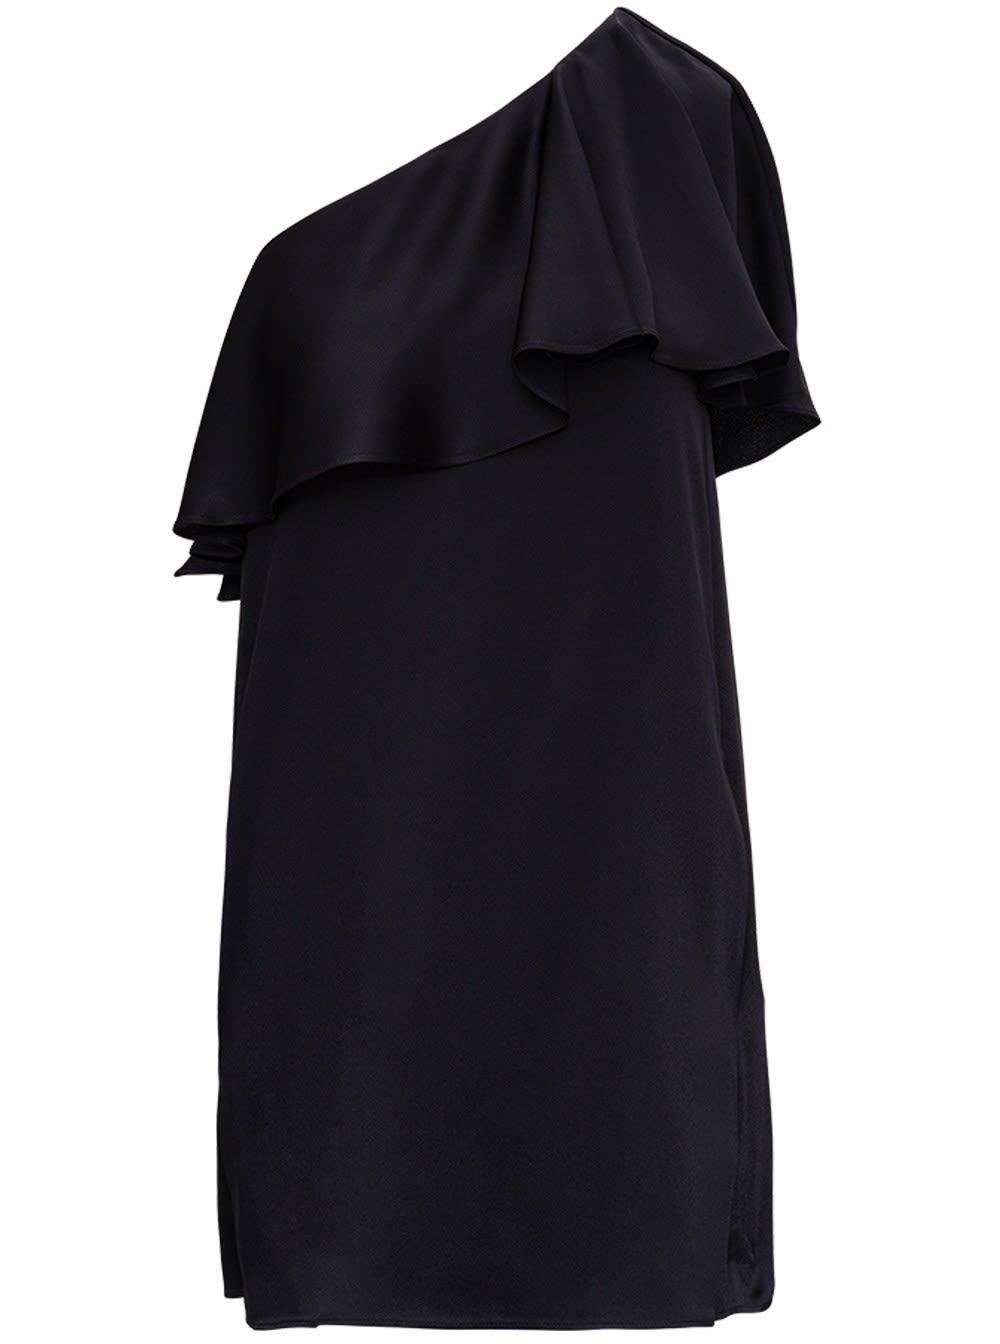 Saint Laurent One Shoulder Silk Satin Dress With Ruffles